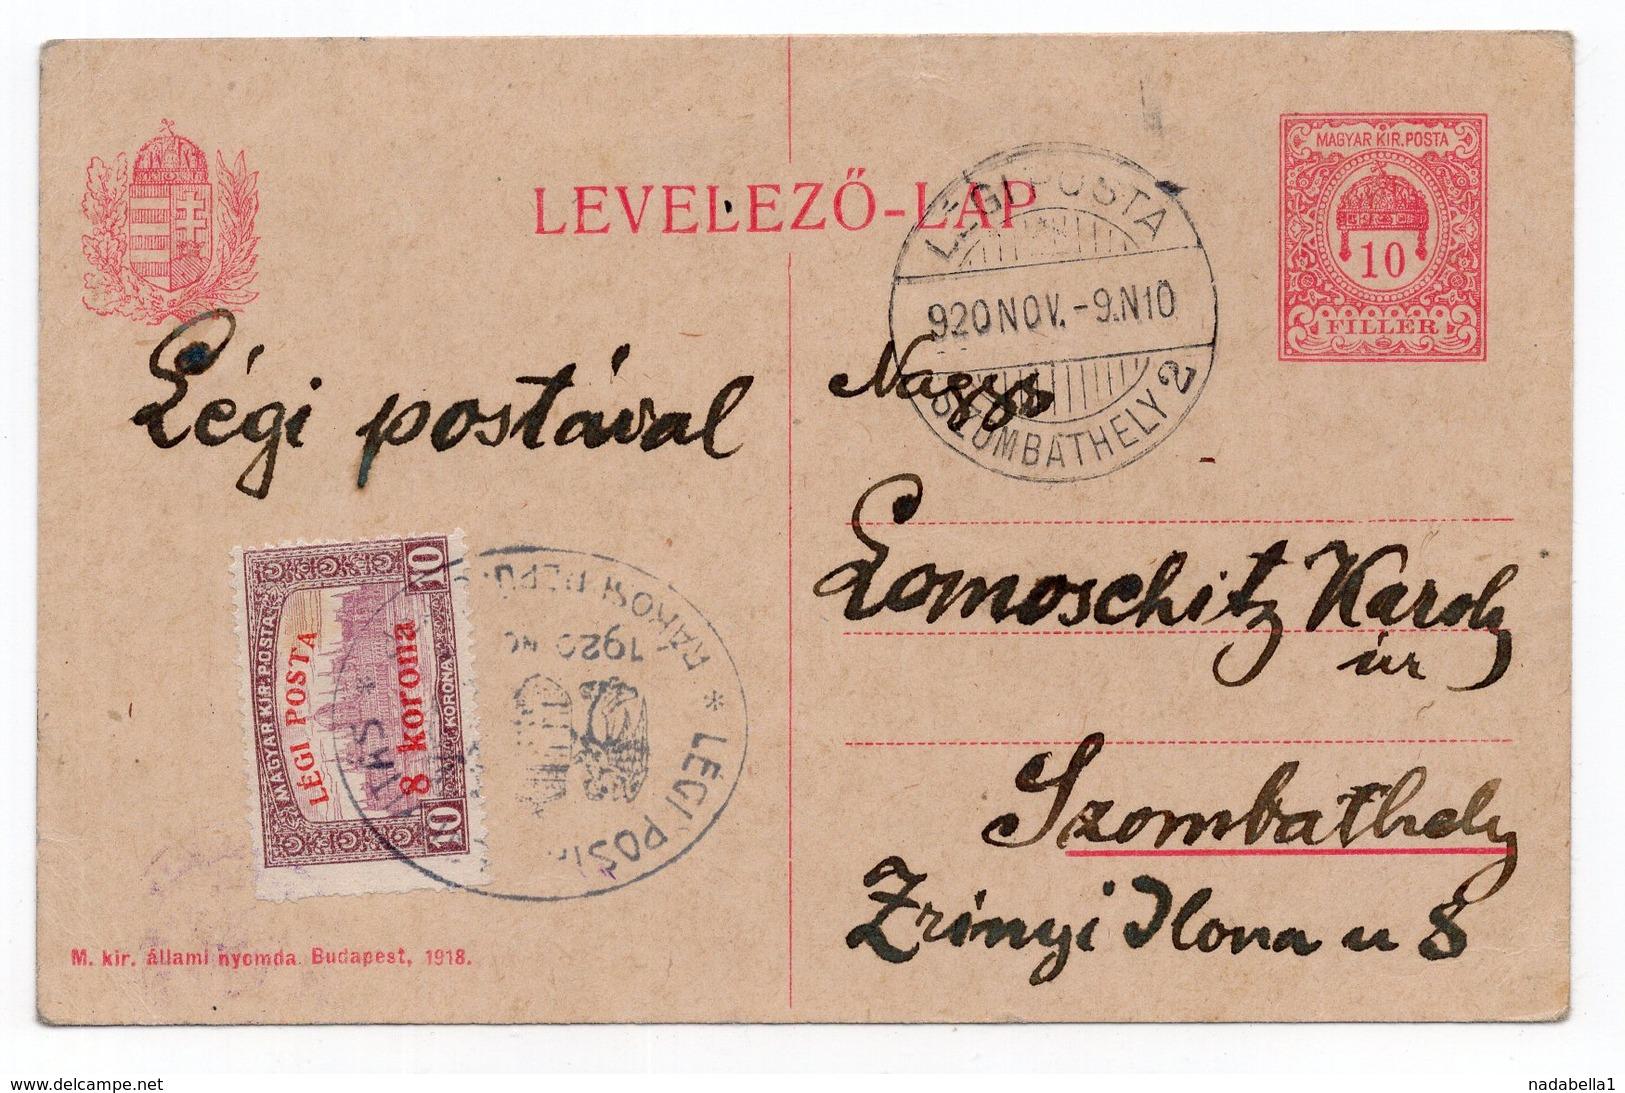 09.11.1920 HUNGARY, LEGI POSTA, STATIONERY CARD, USED - Postal Stationery